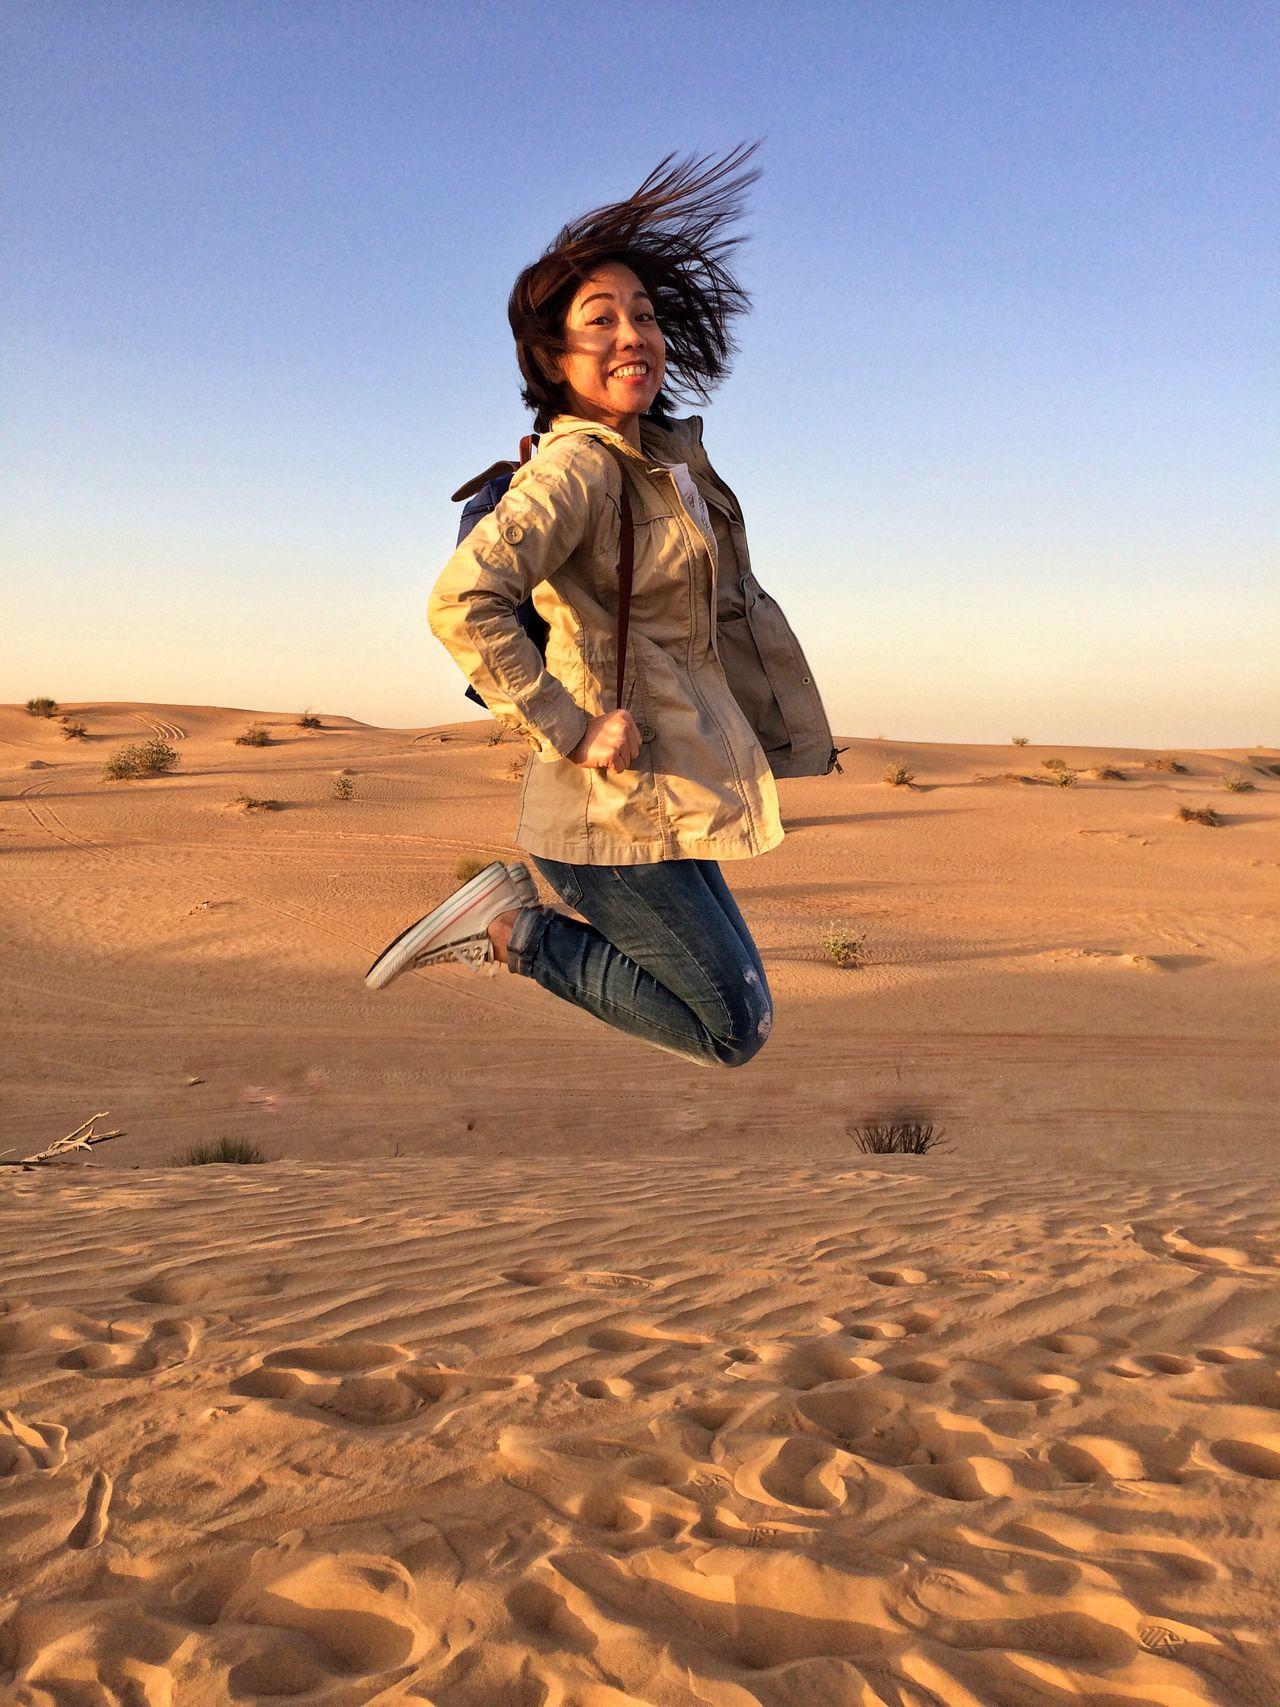 Sand One Person Desert Sand Dune EyeEmNewHere